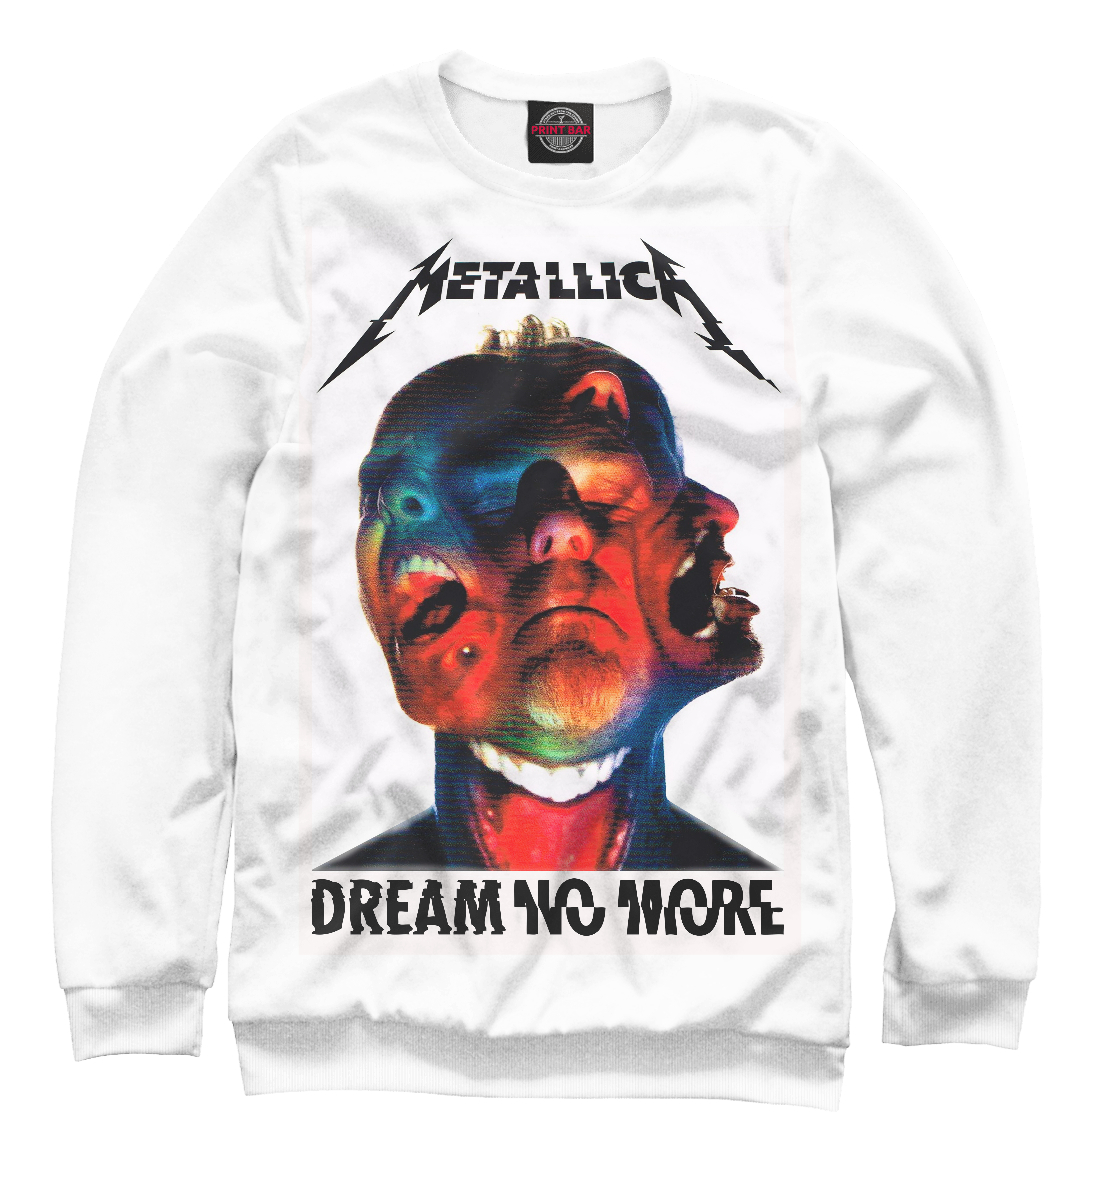 Metallica Dream No More, Printbar, Свитшоты, MET-651214-swi-1  - купить со скидкой